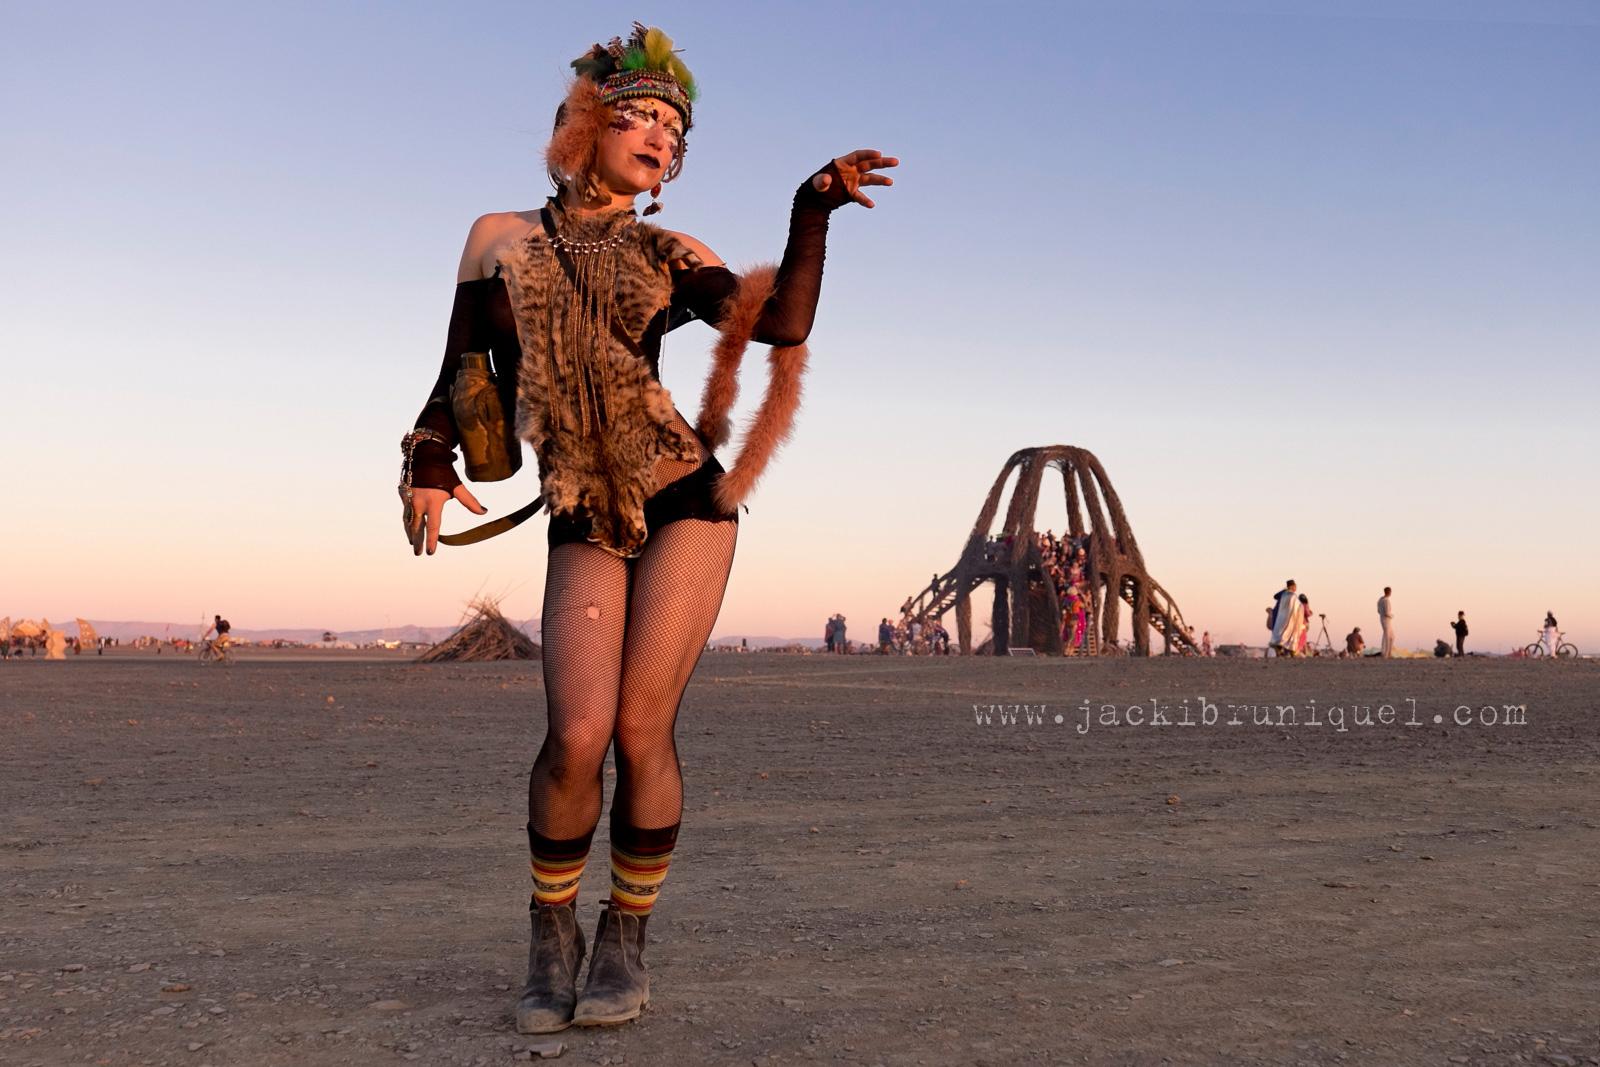 Afrika-Burn-2016-Creative-South-African-Photographer-Jacki-Bruniquel-030.jpg